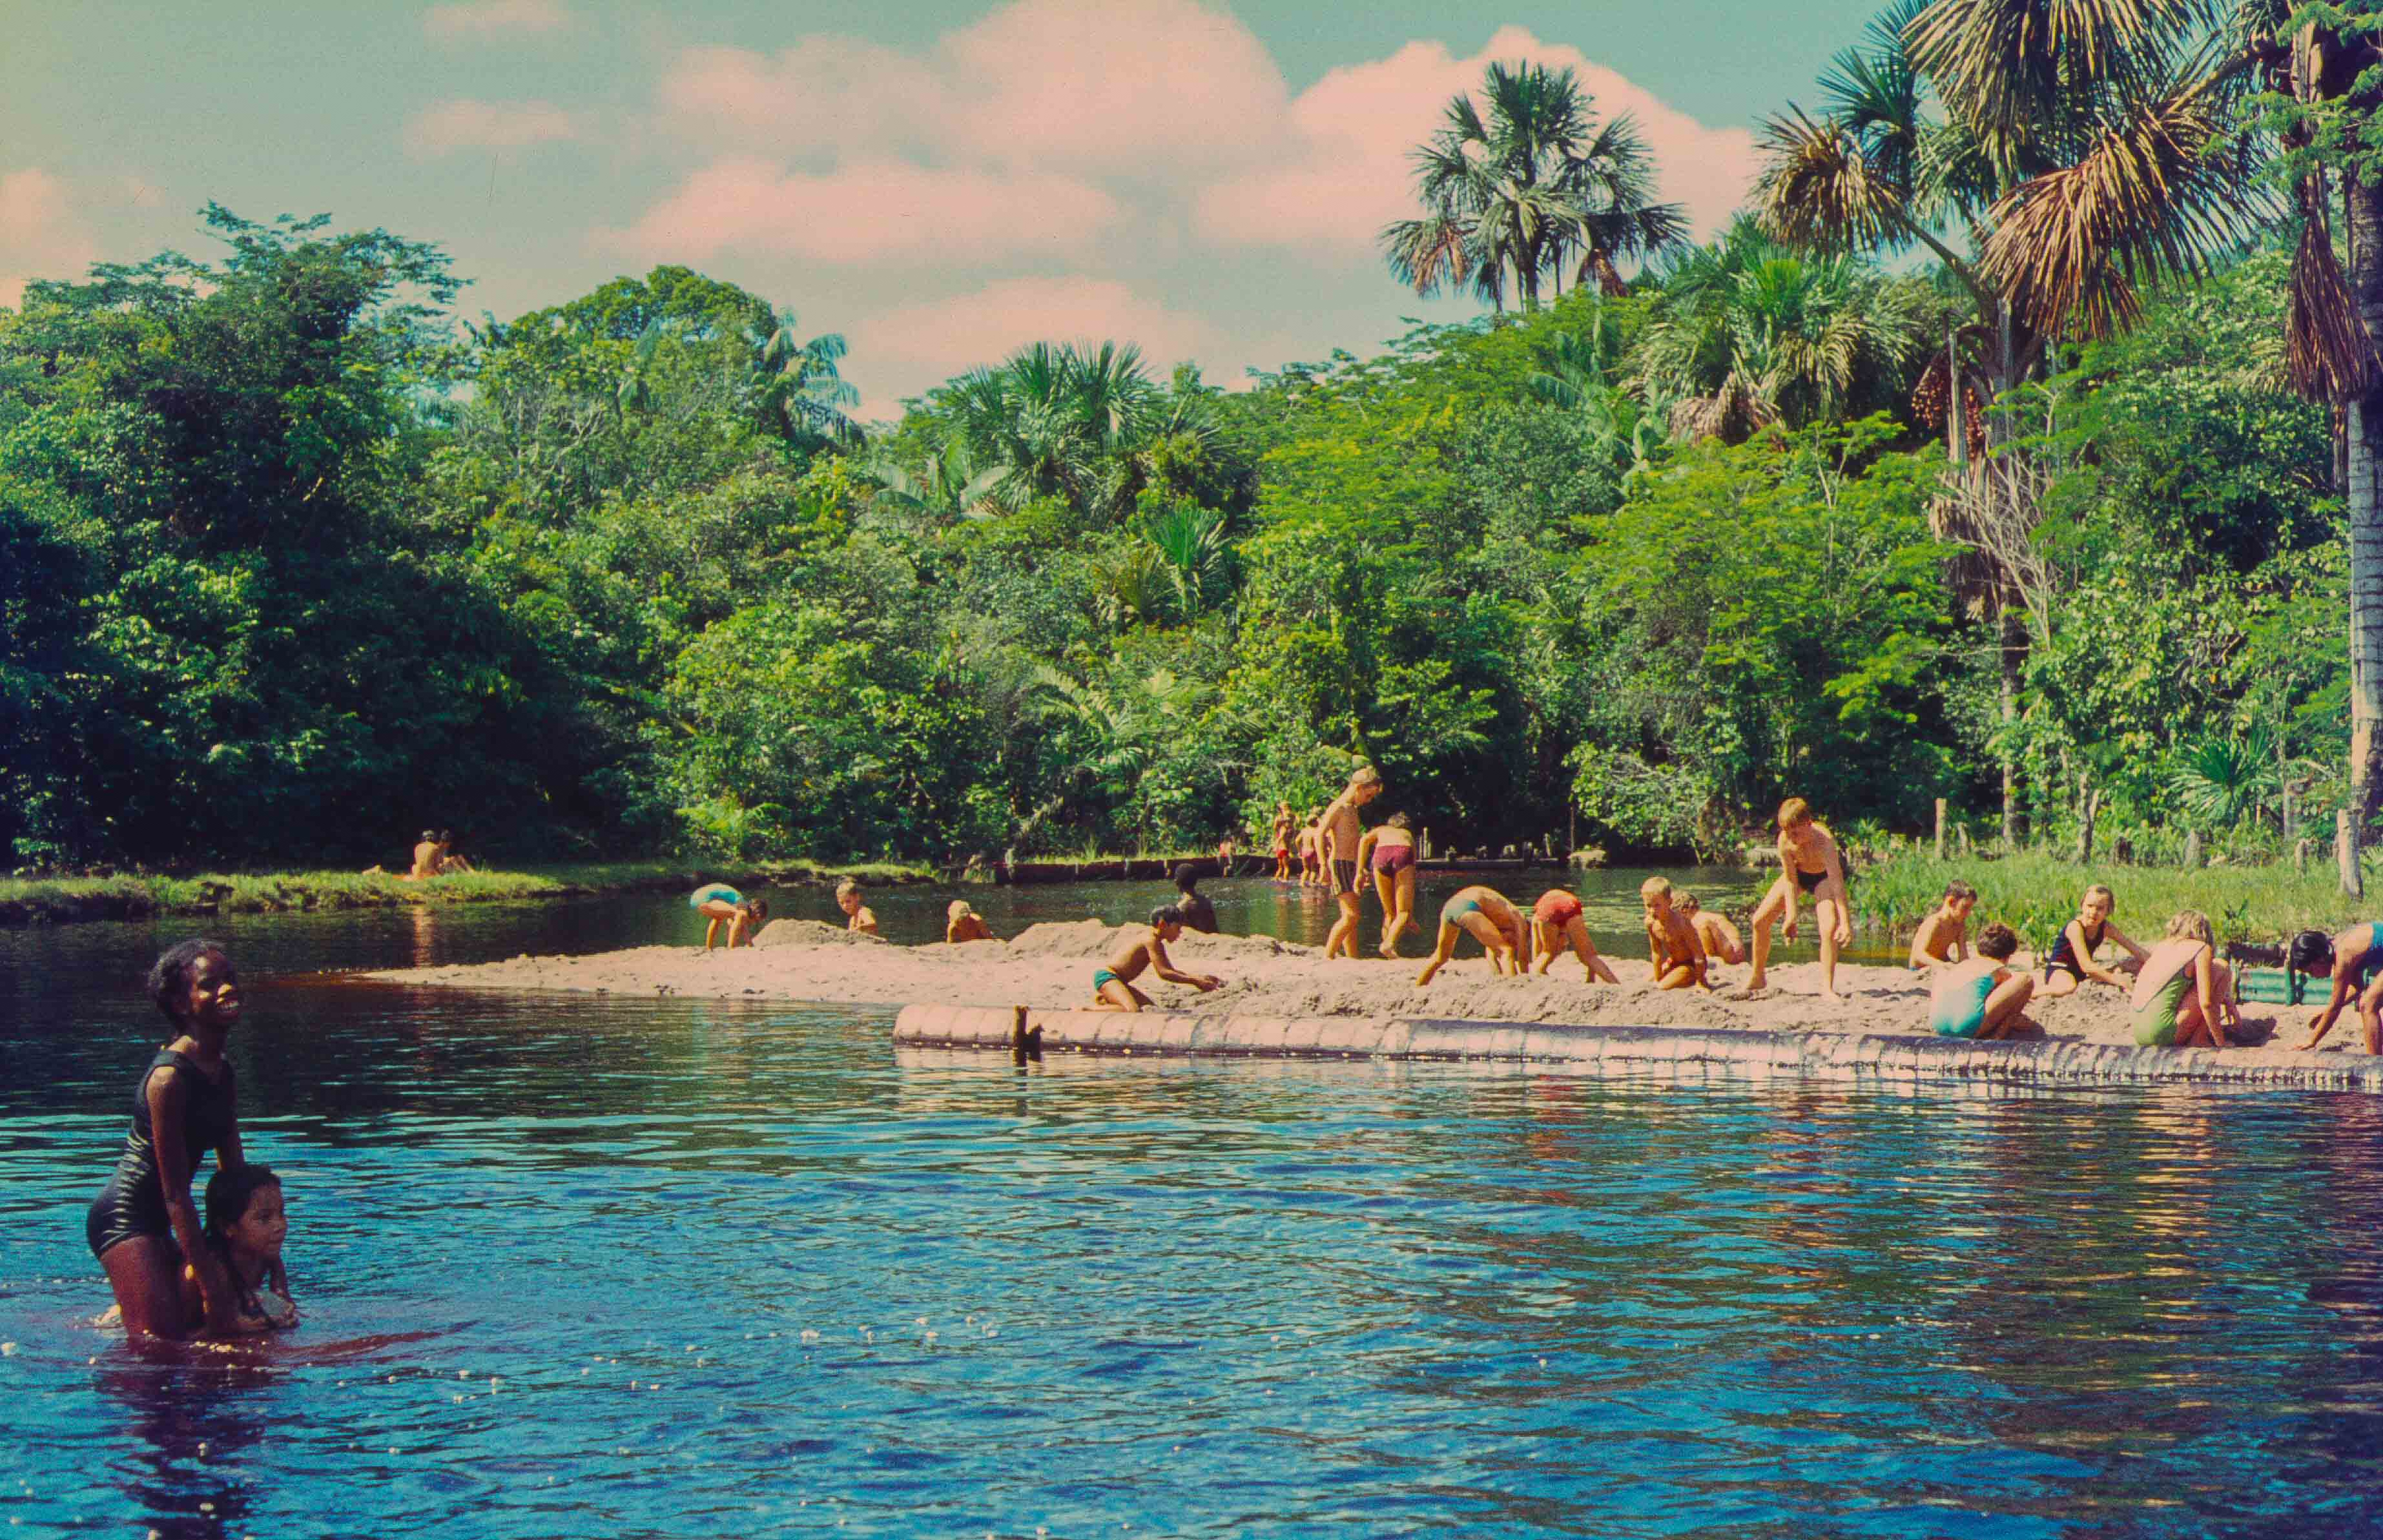 72. Suriname